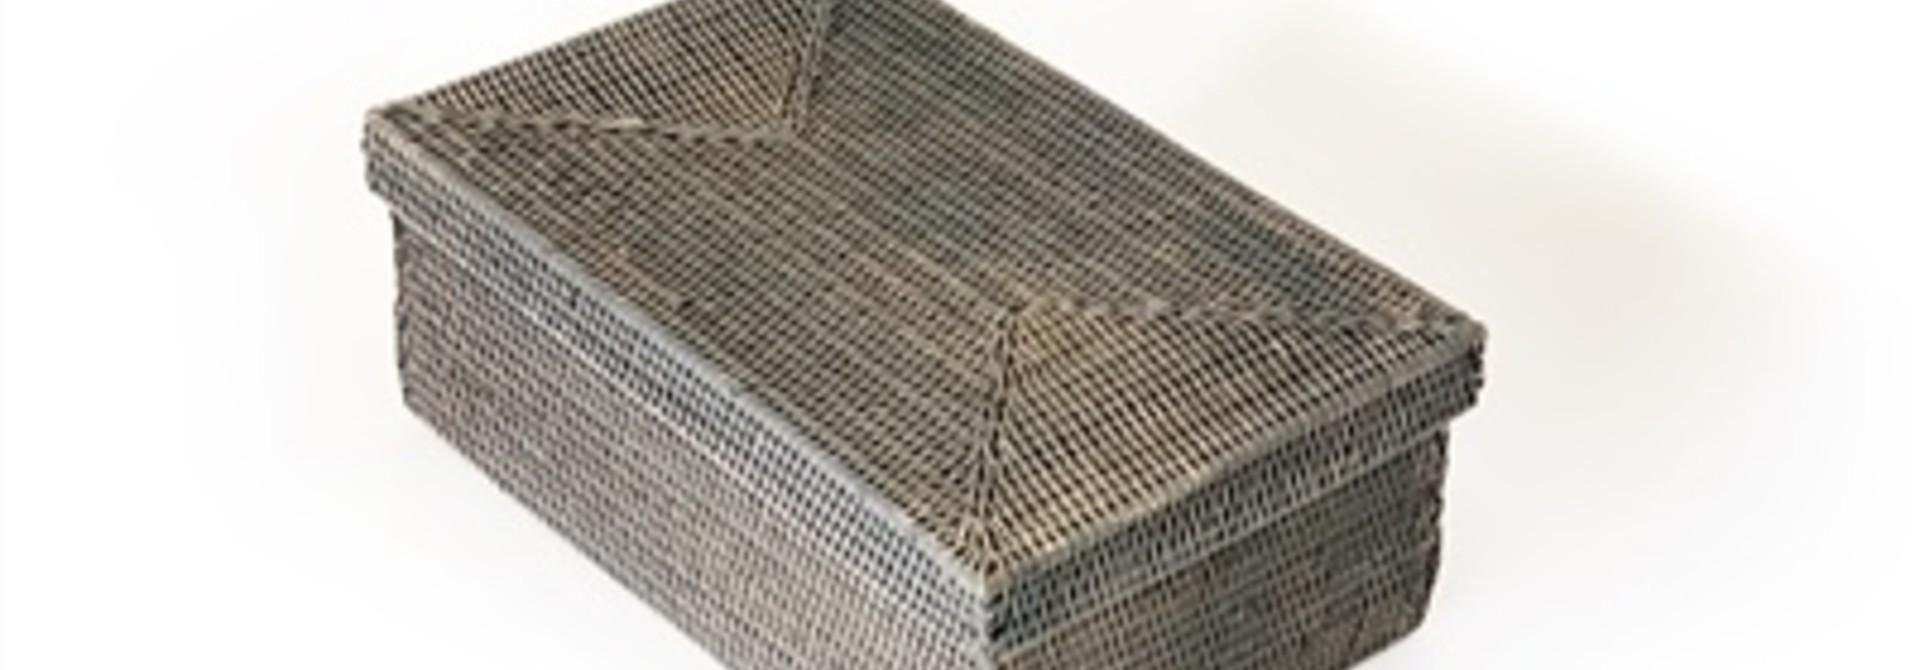 Rectangular Storage Basket w/lid - Grey Wash - Lg